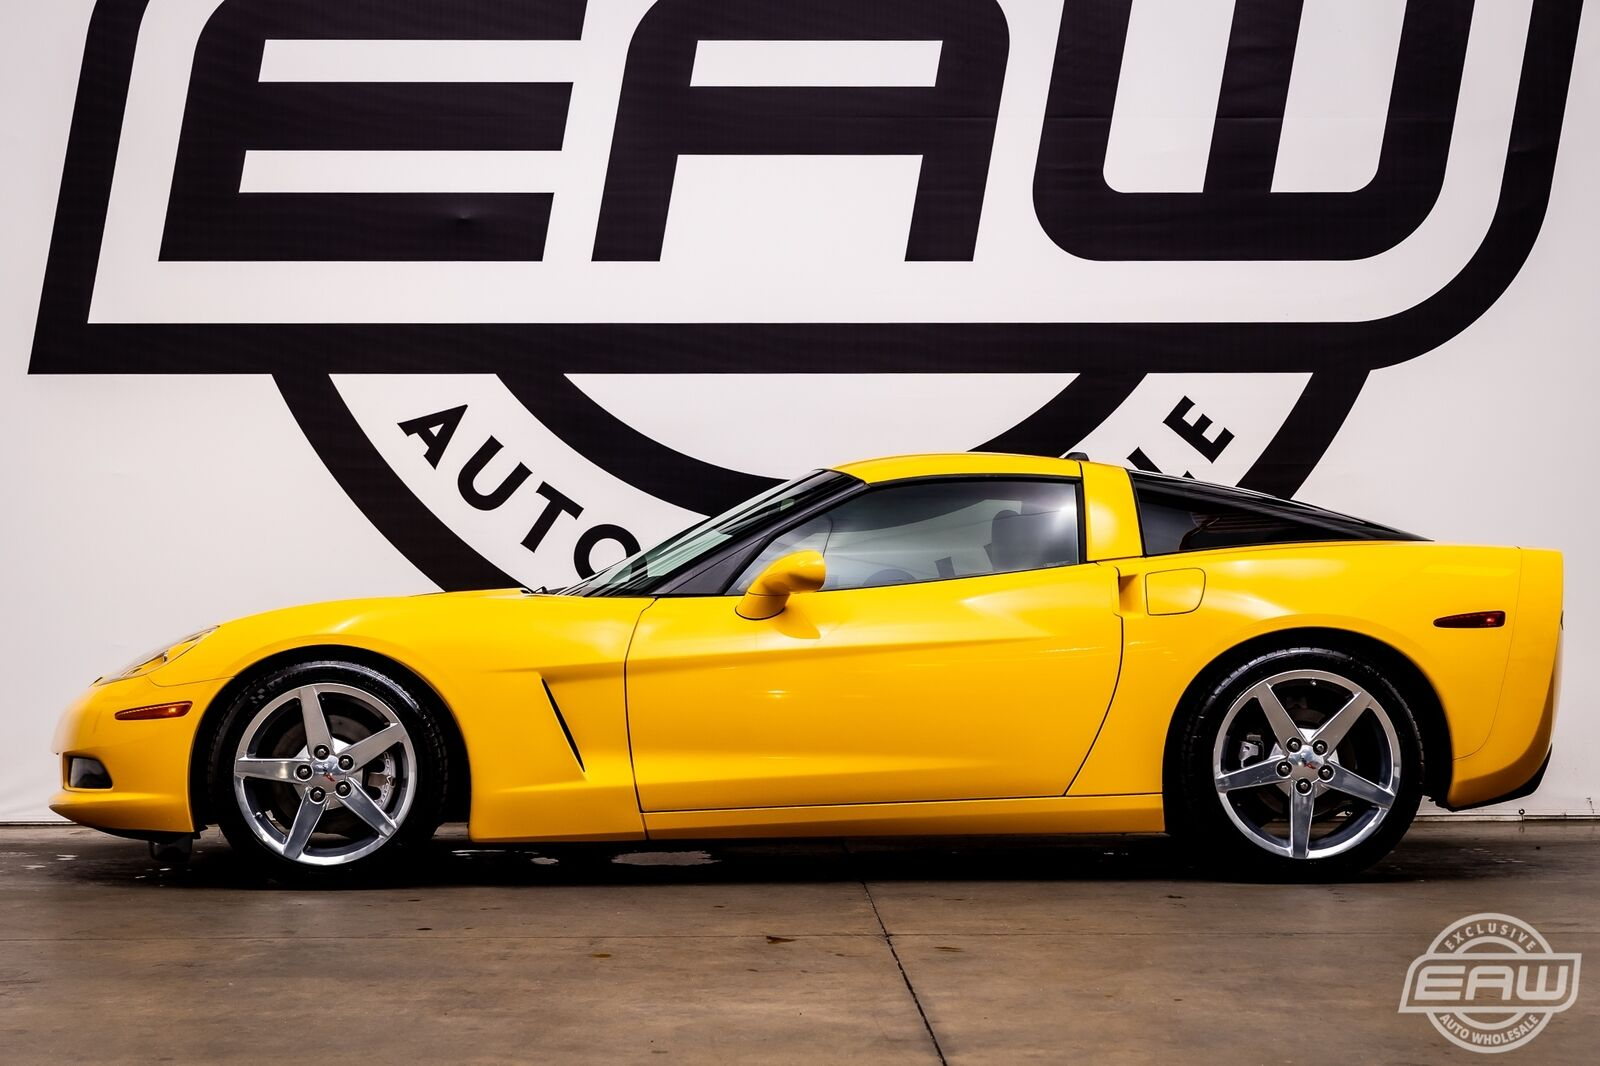 2005 Yellow Chevrolet Corvette Coupe  | C6 Corvette Photo 3